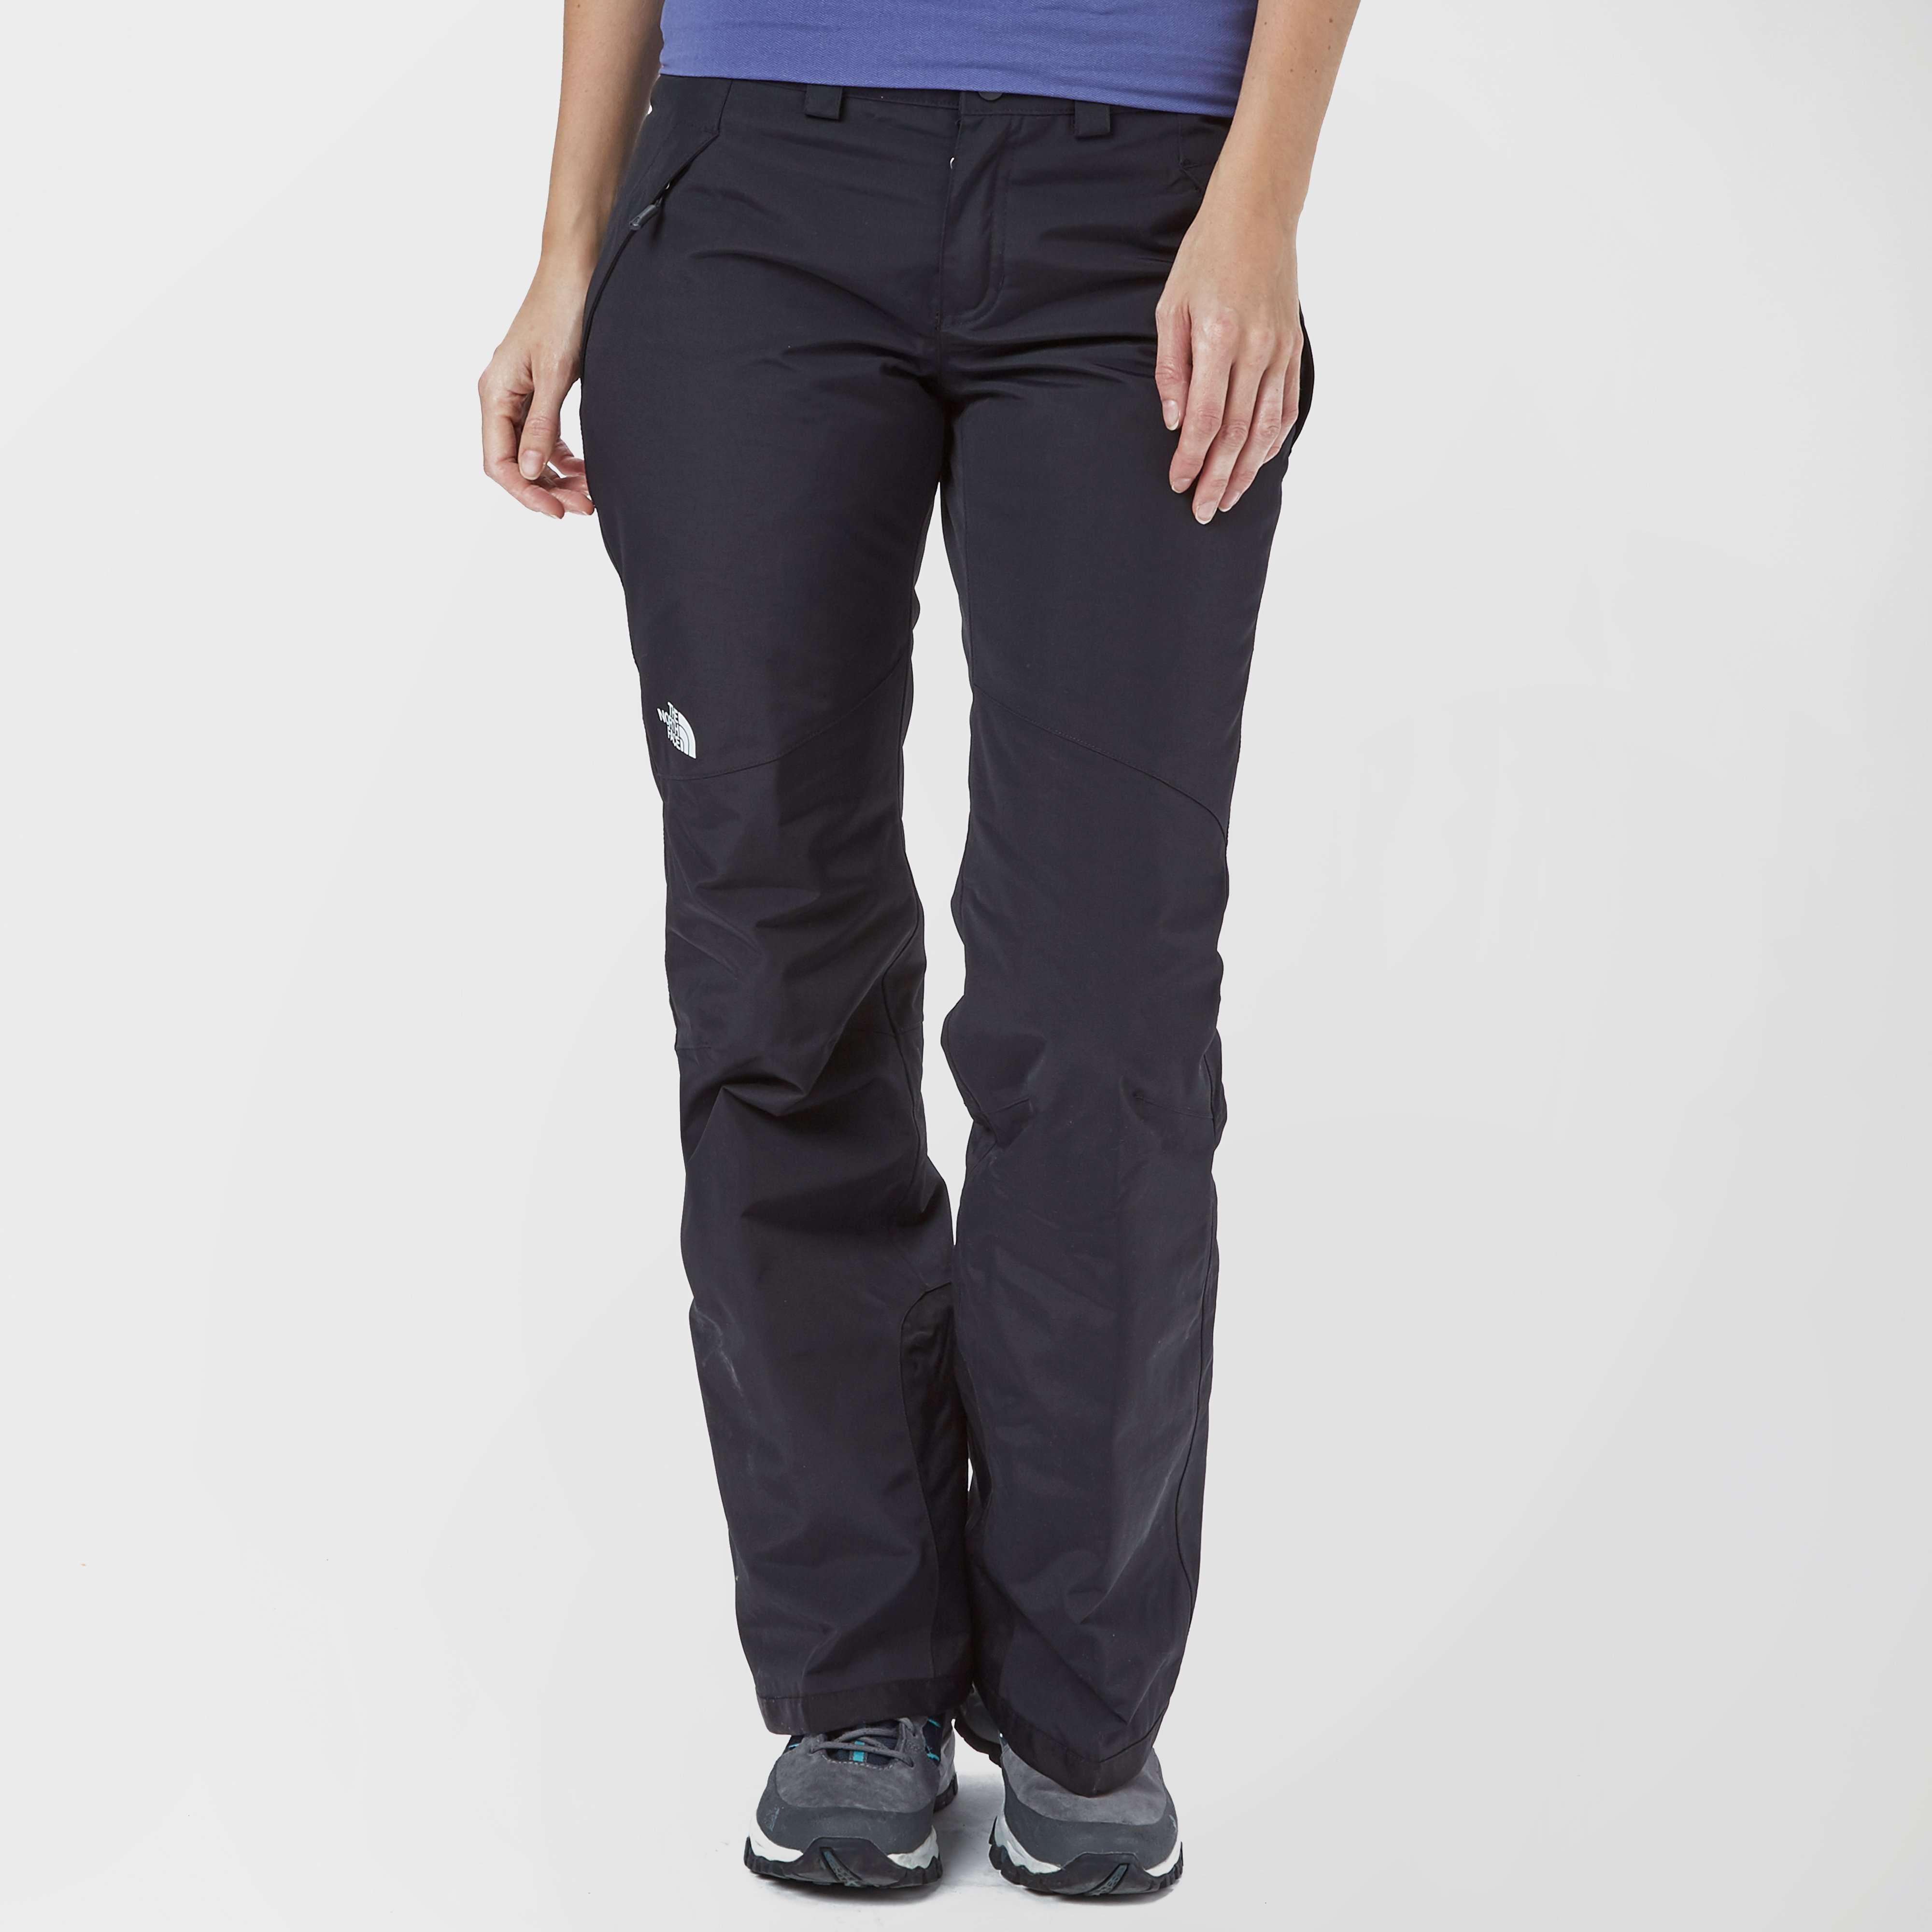 THE NORTH FACE Women's Presena Ski Pants